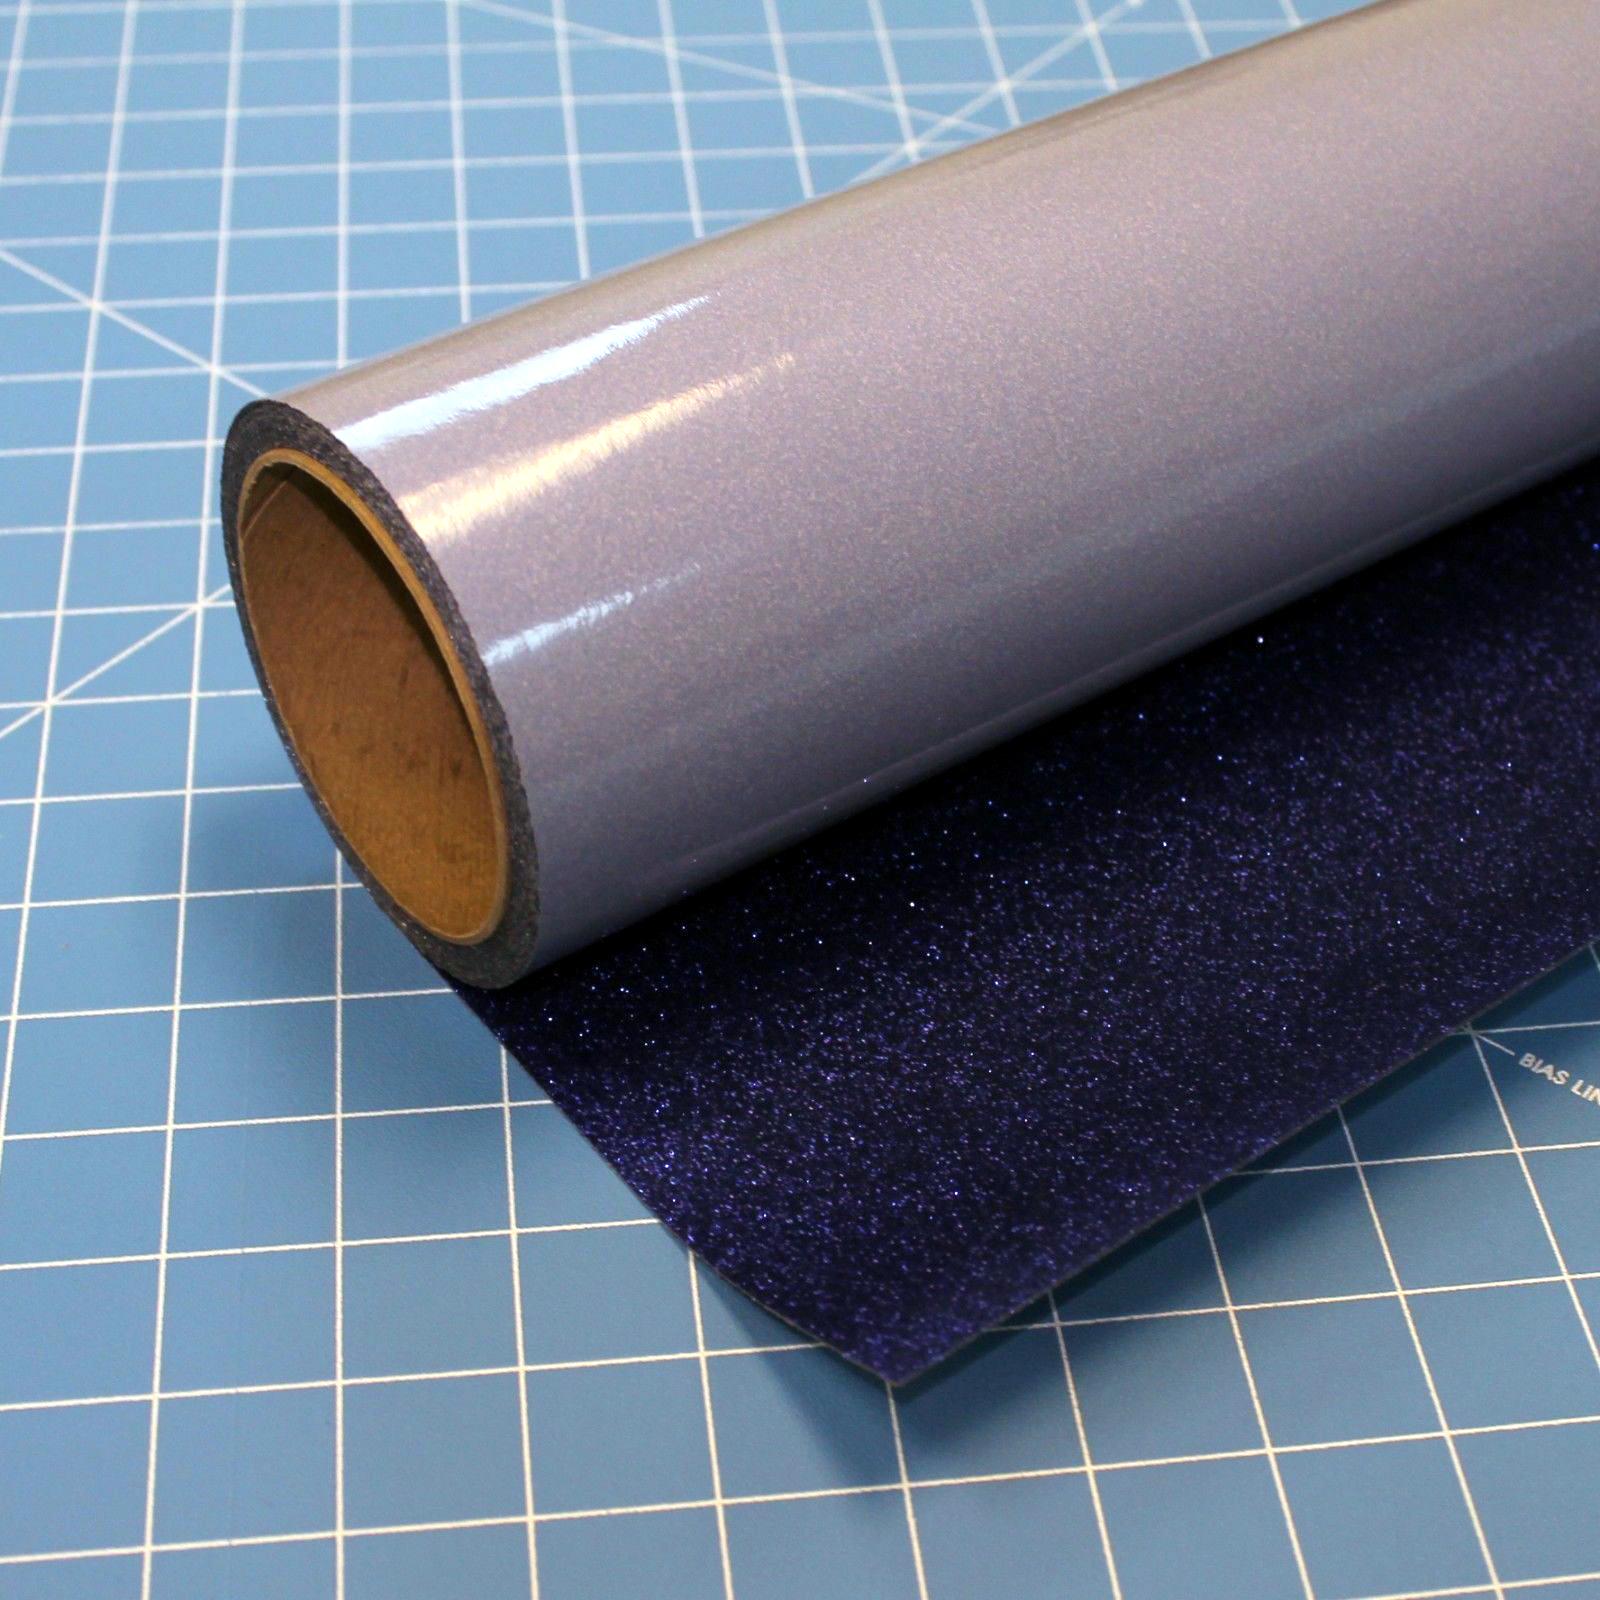 "Royal Blue Glitterflex Ultra 19.5"" x 3' Roll Glitter, Heat Transfer Vinyl, HTV"